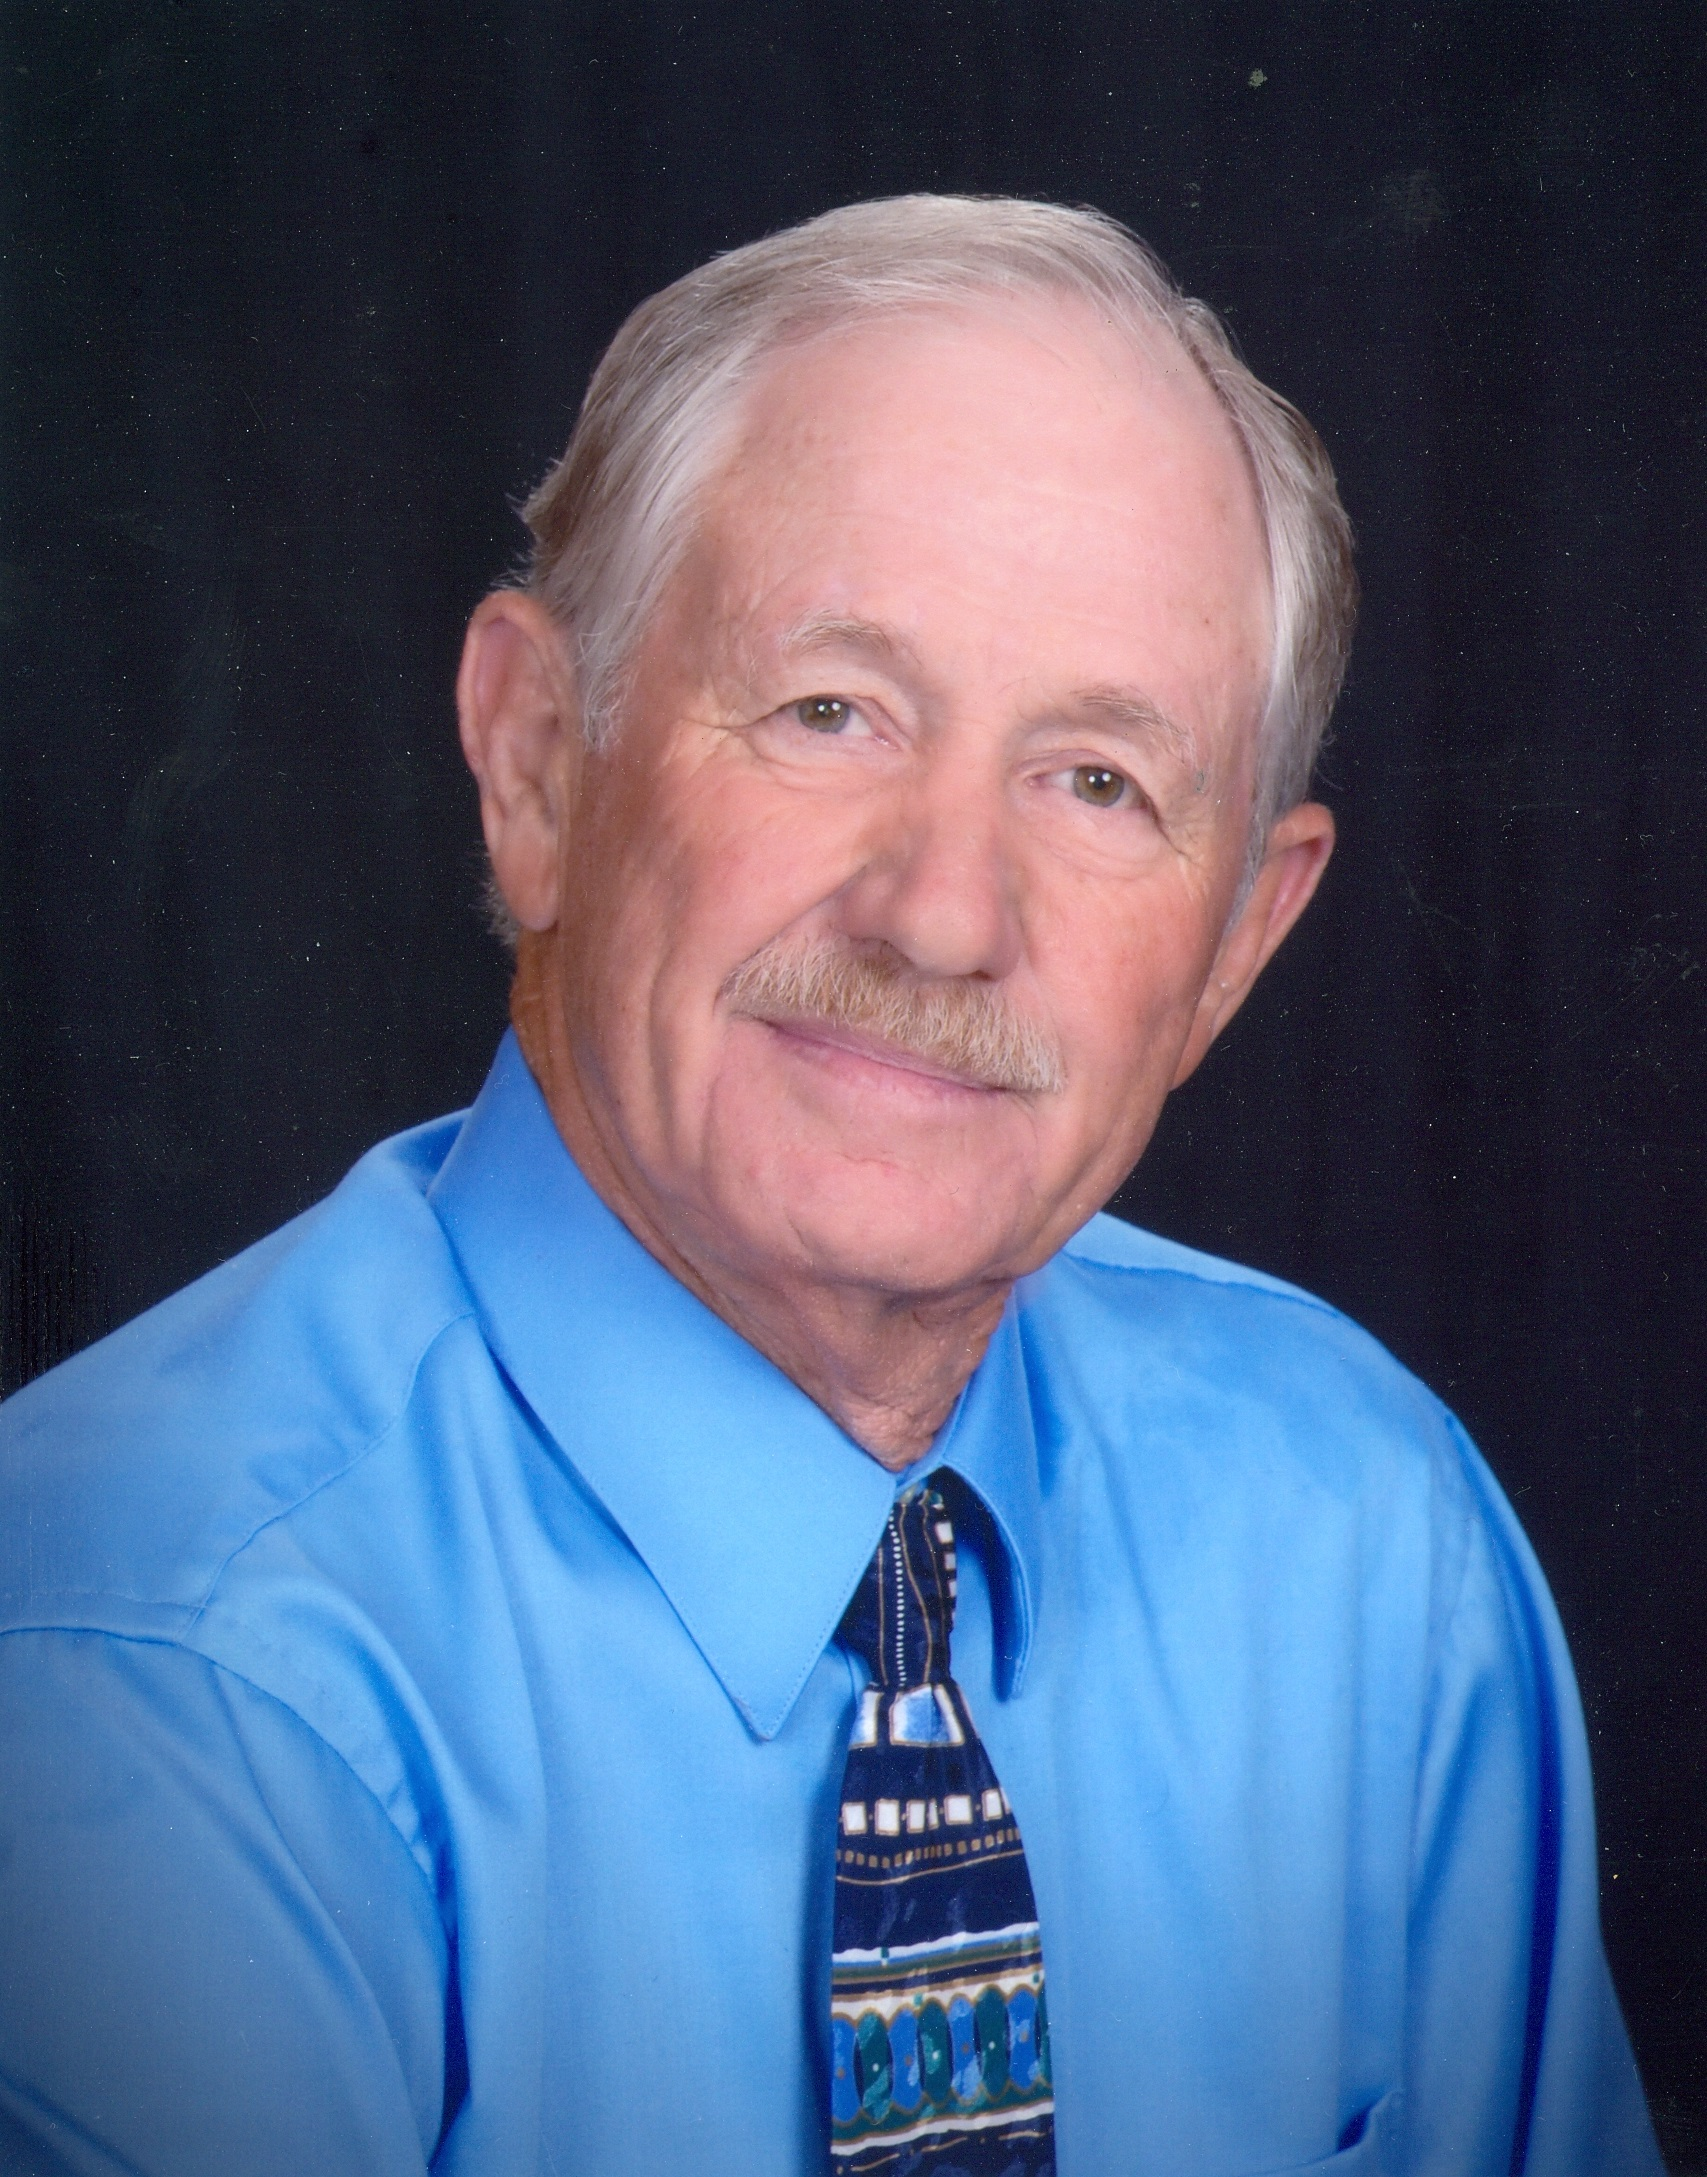 Clinton R. Shurigar, age72, of Fremont, Nebraska